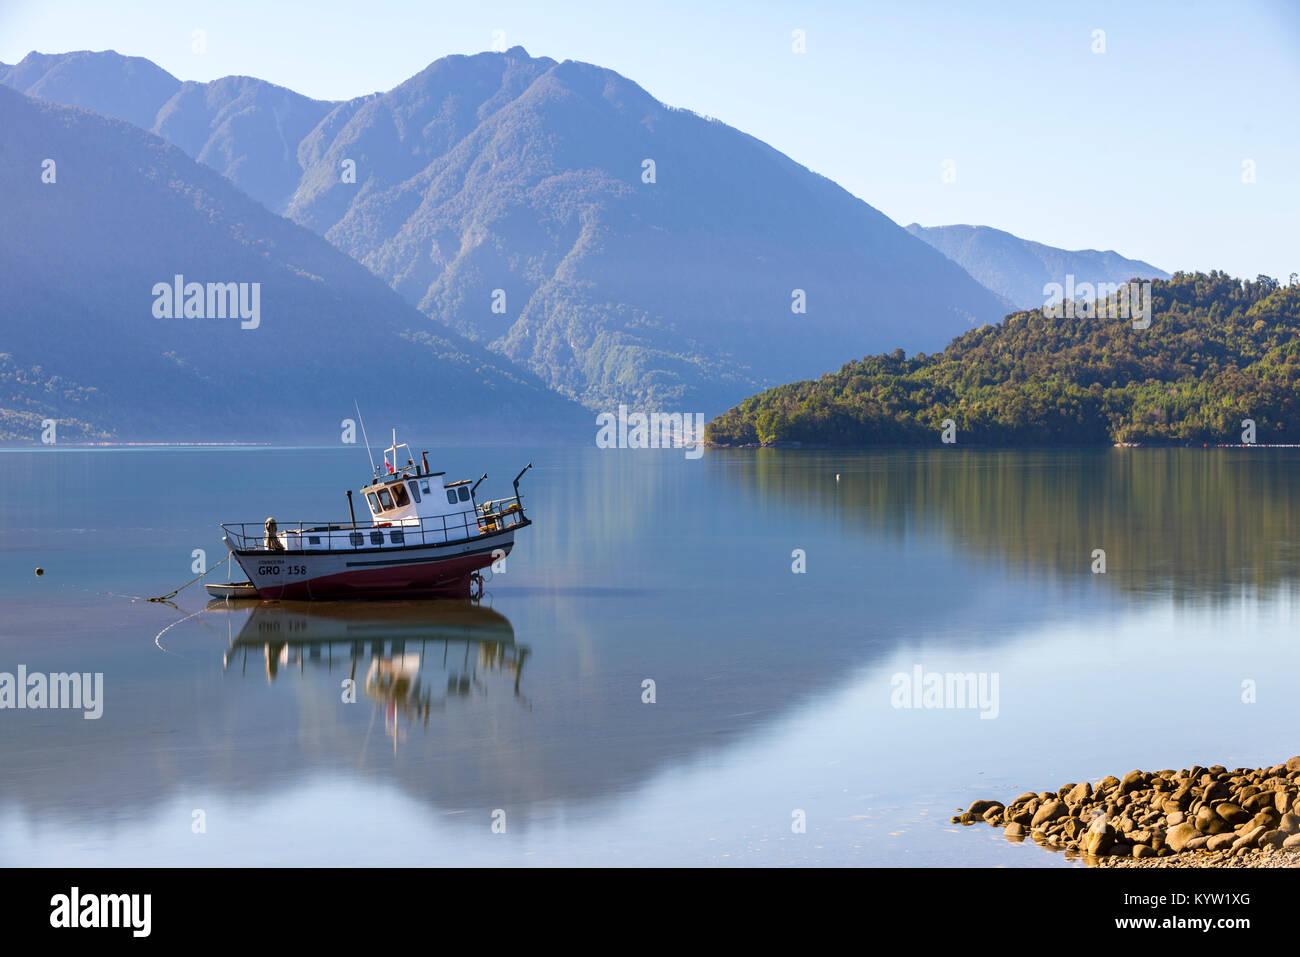 Hornopiren, Chile - Stock Image